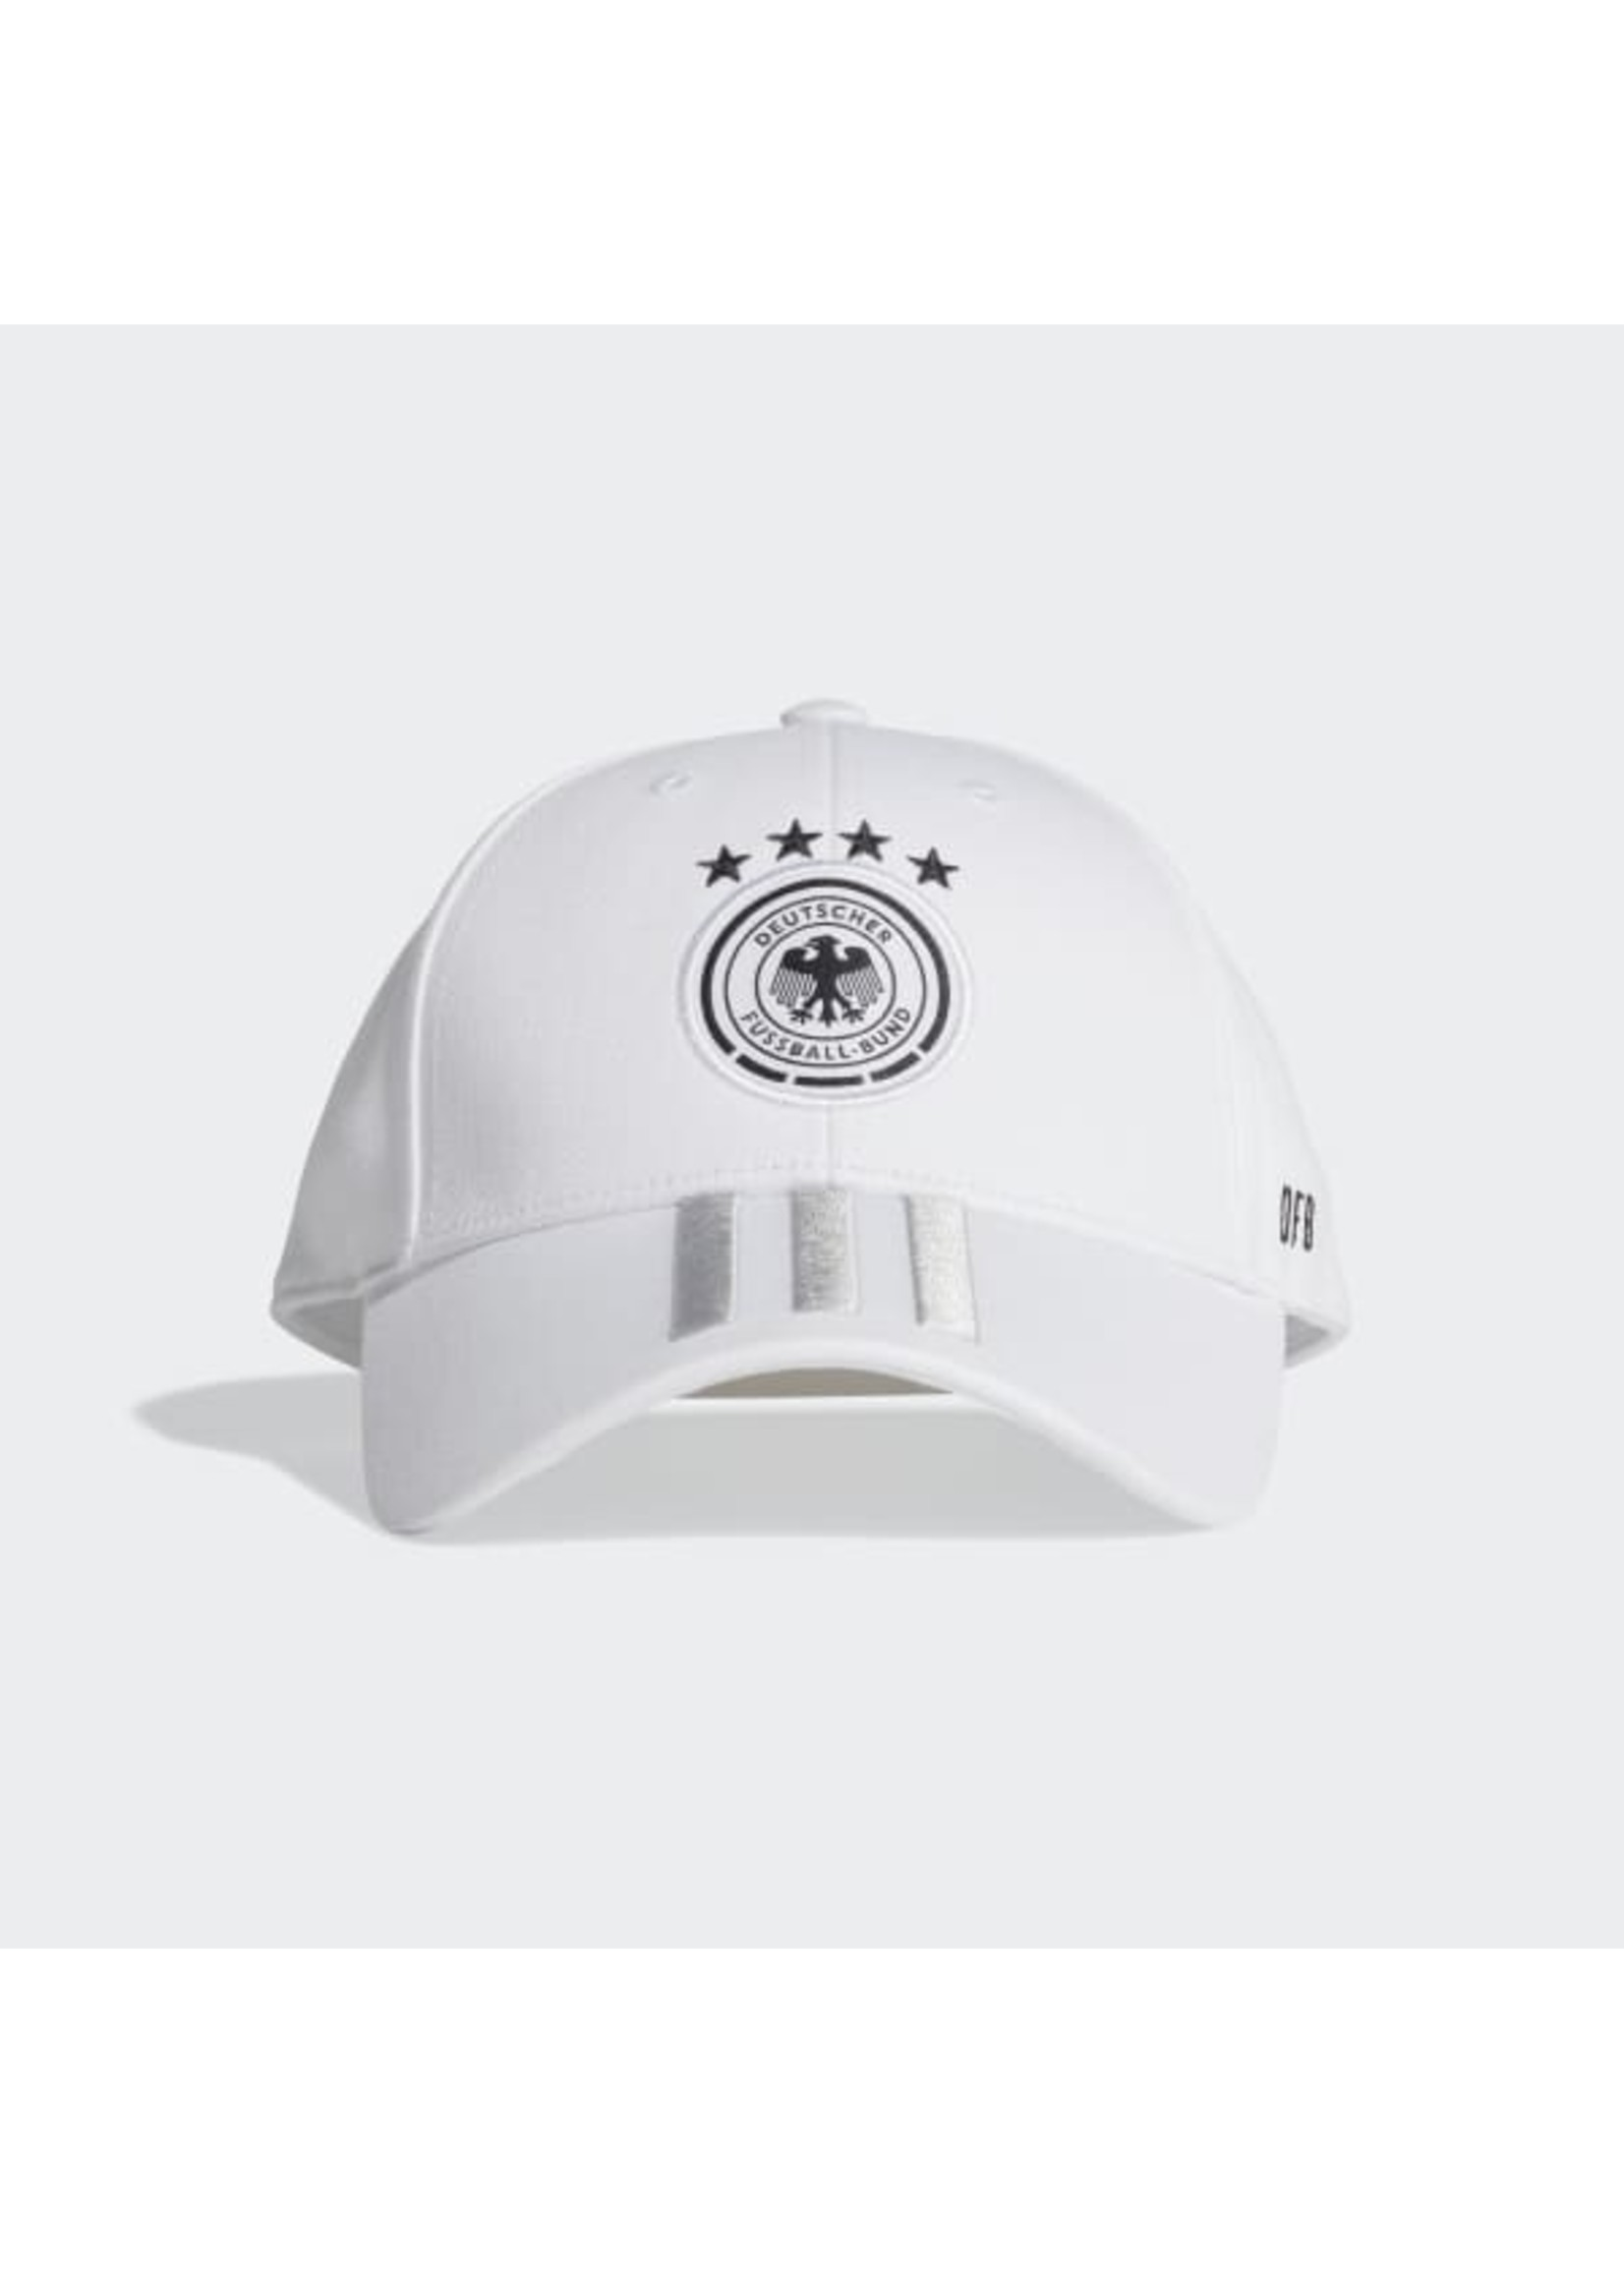 Adidas GERMANY CAP